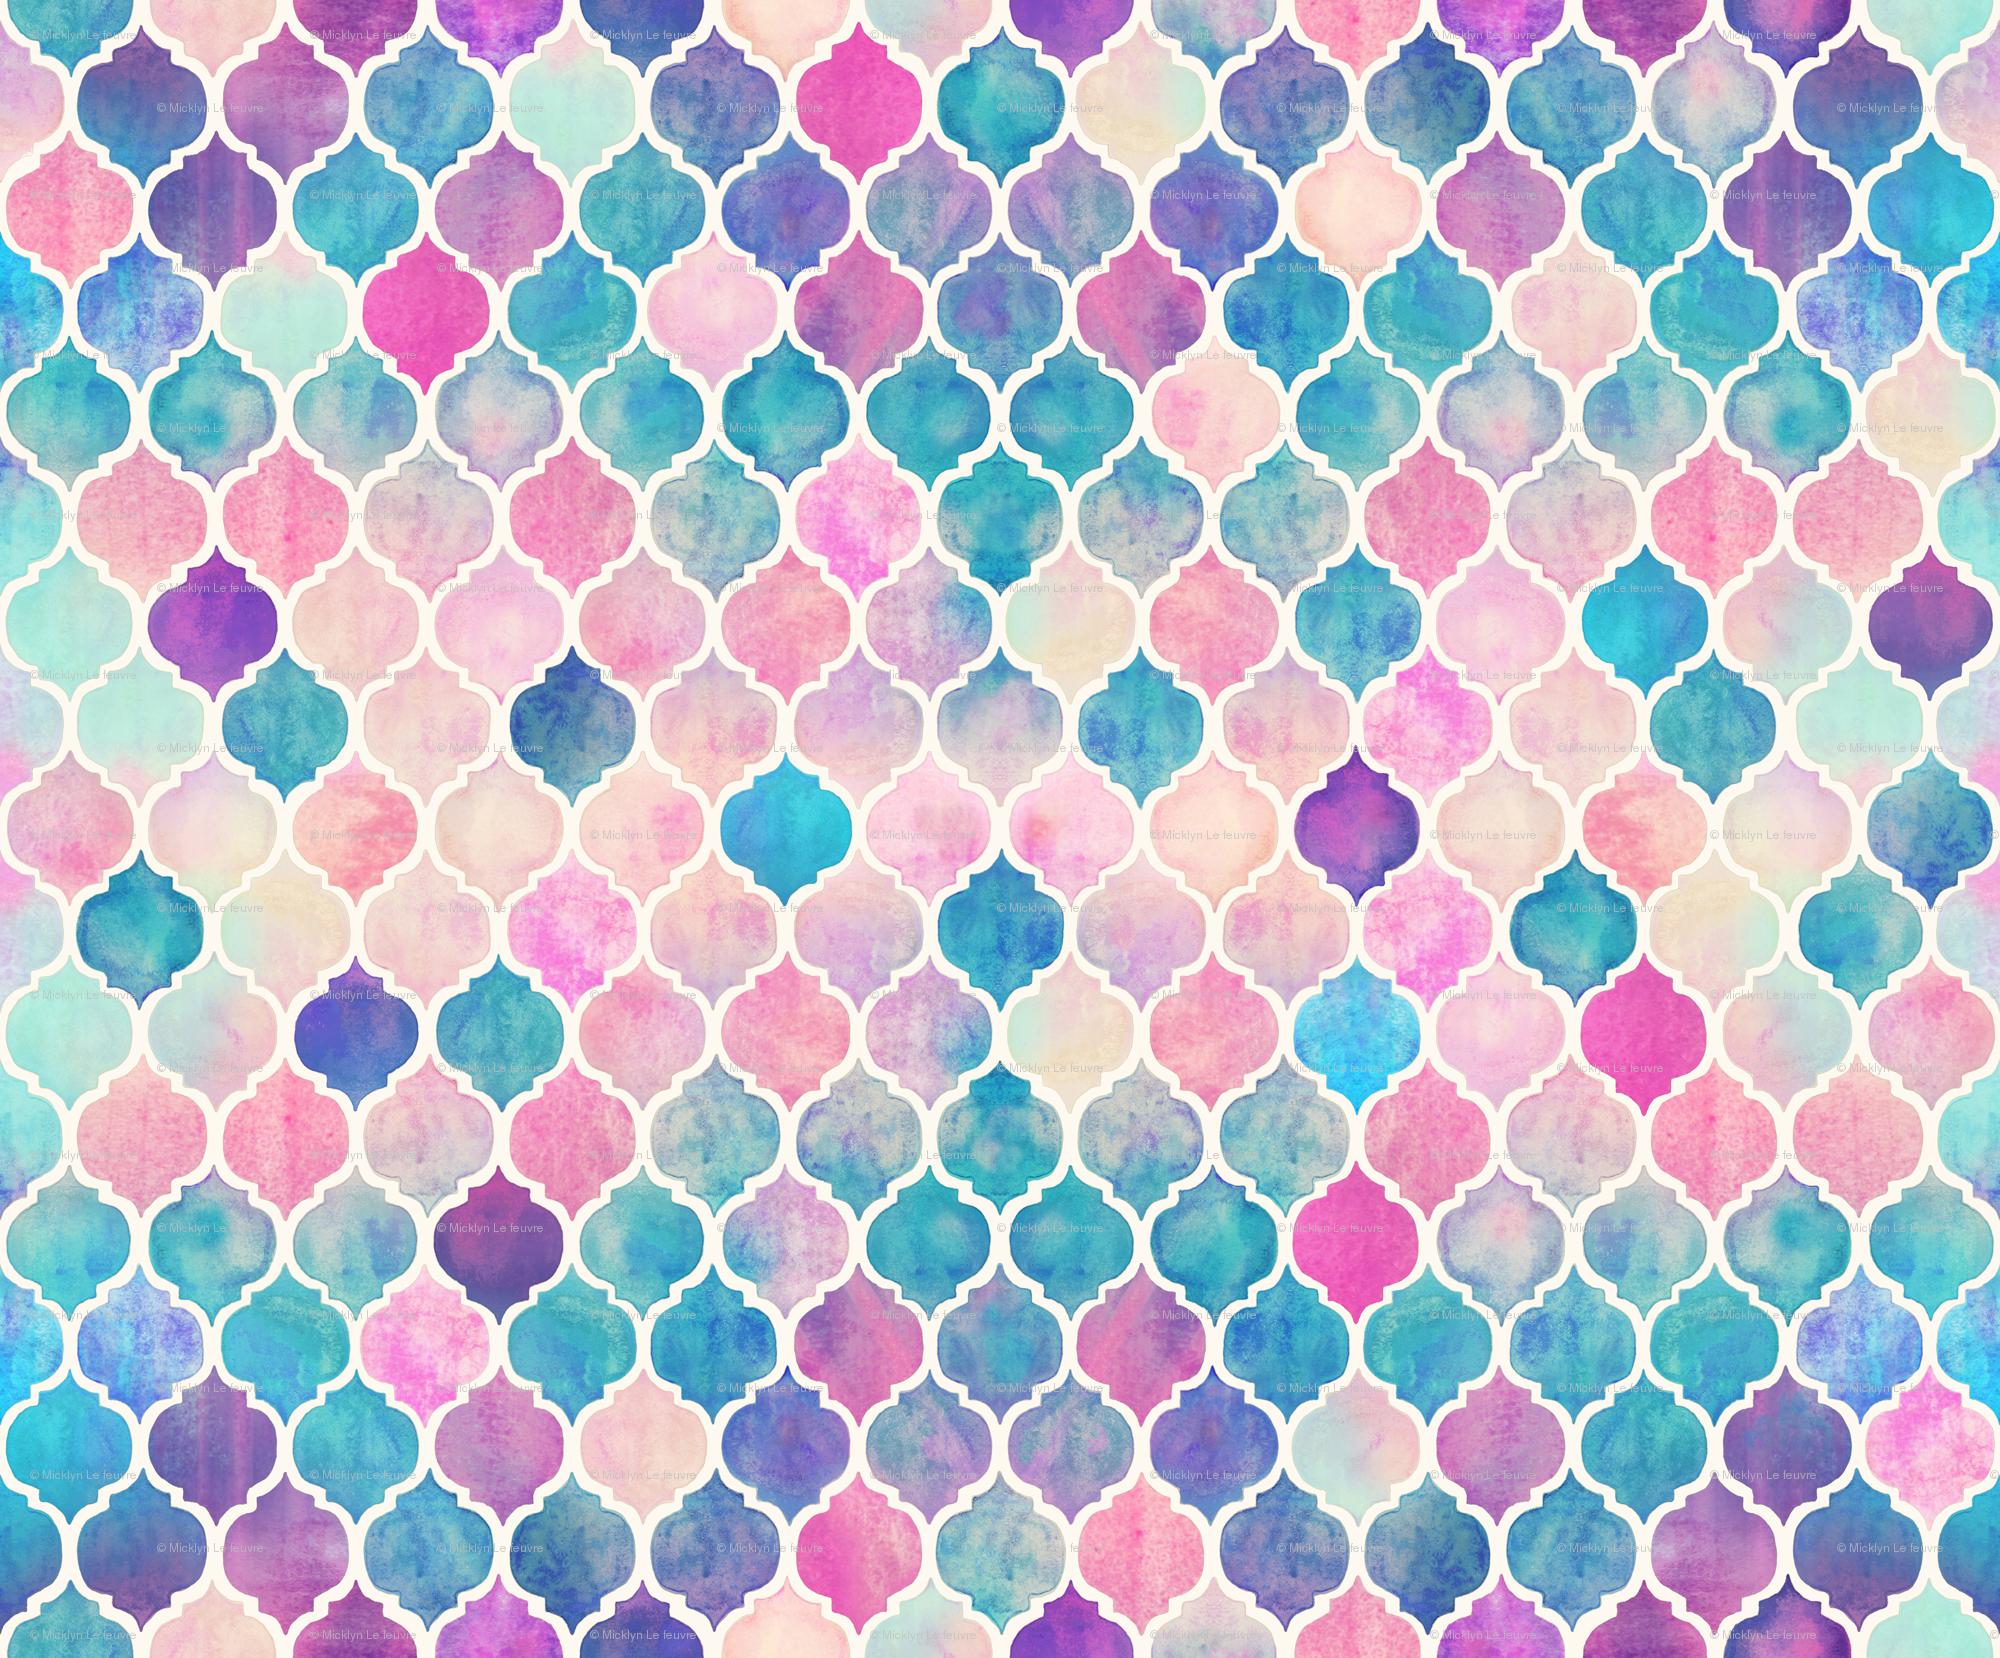 Rainbow Pastel Watercolor Moroccan Pattern wallpaper - micklyn ...